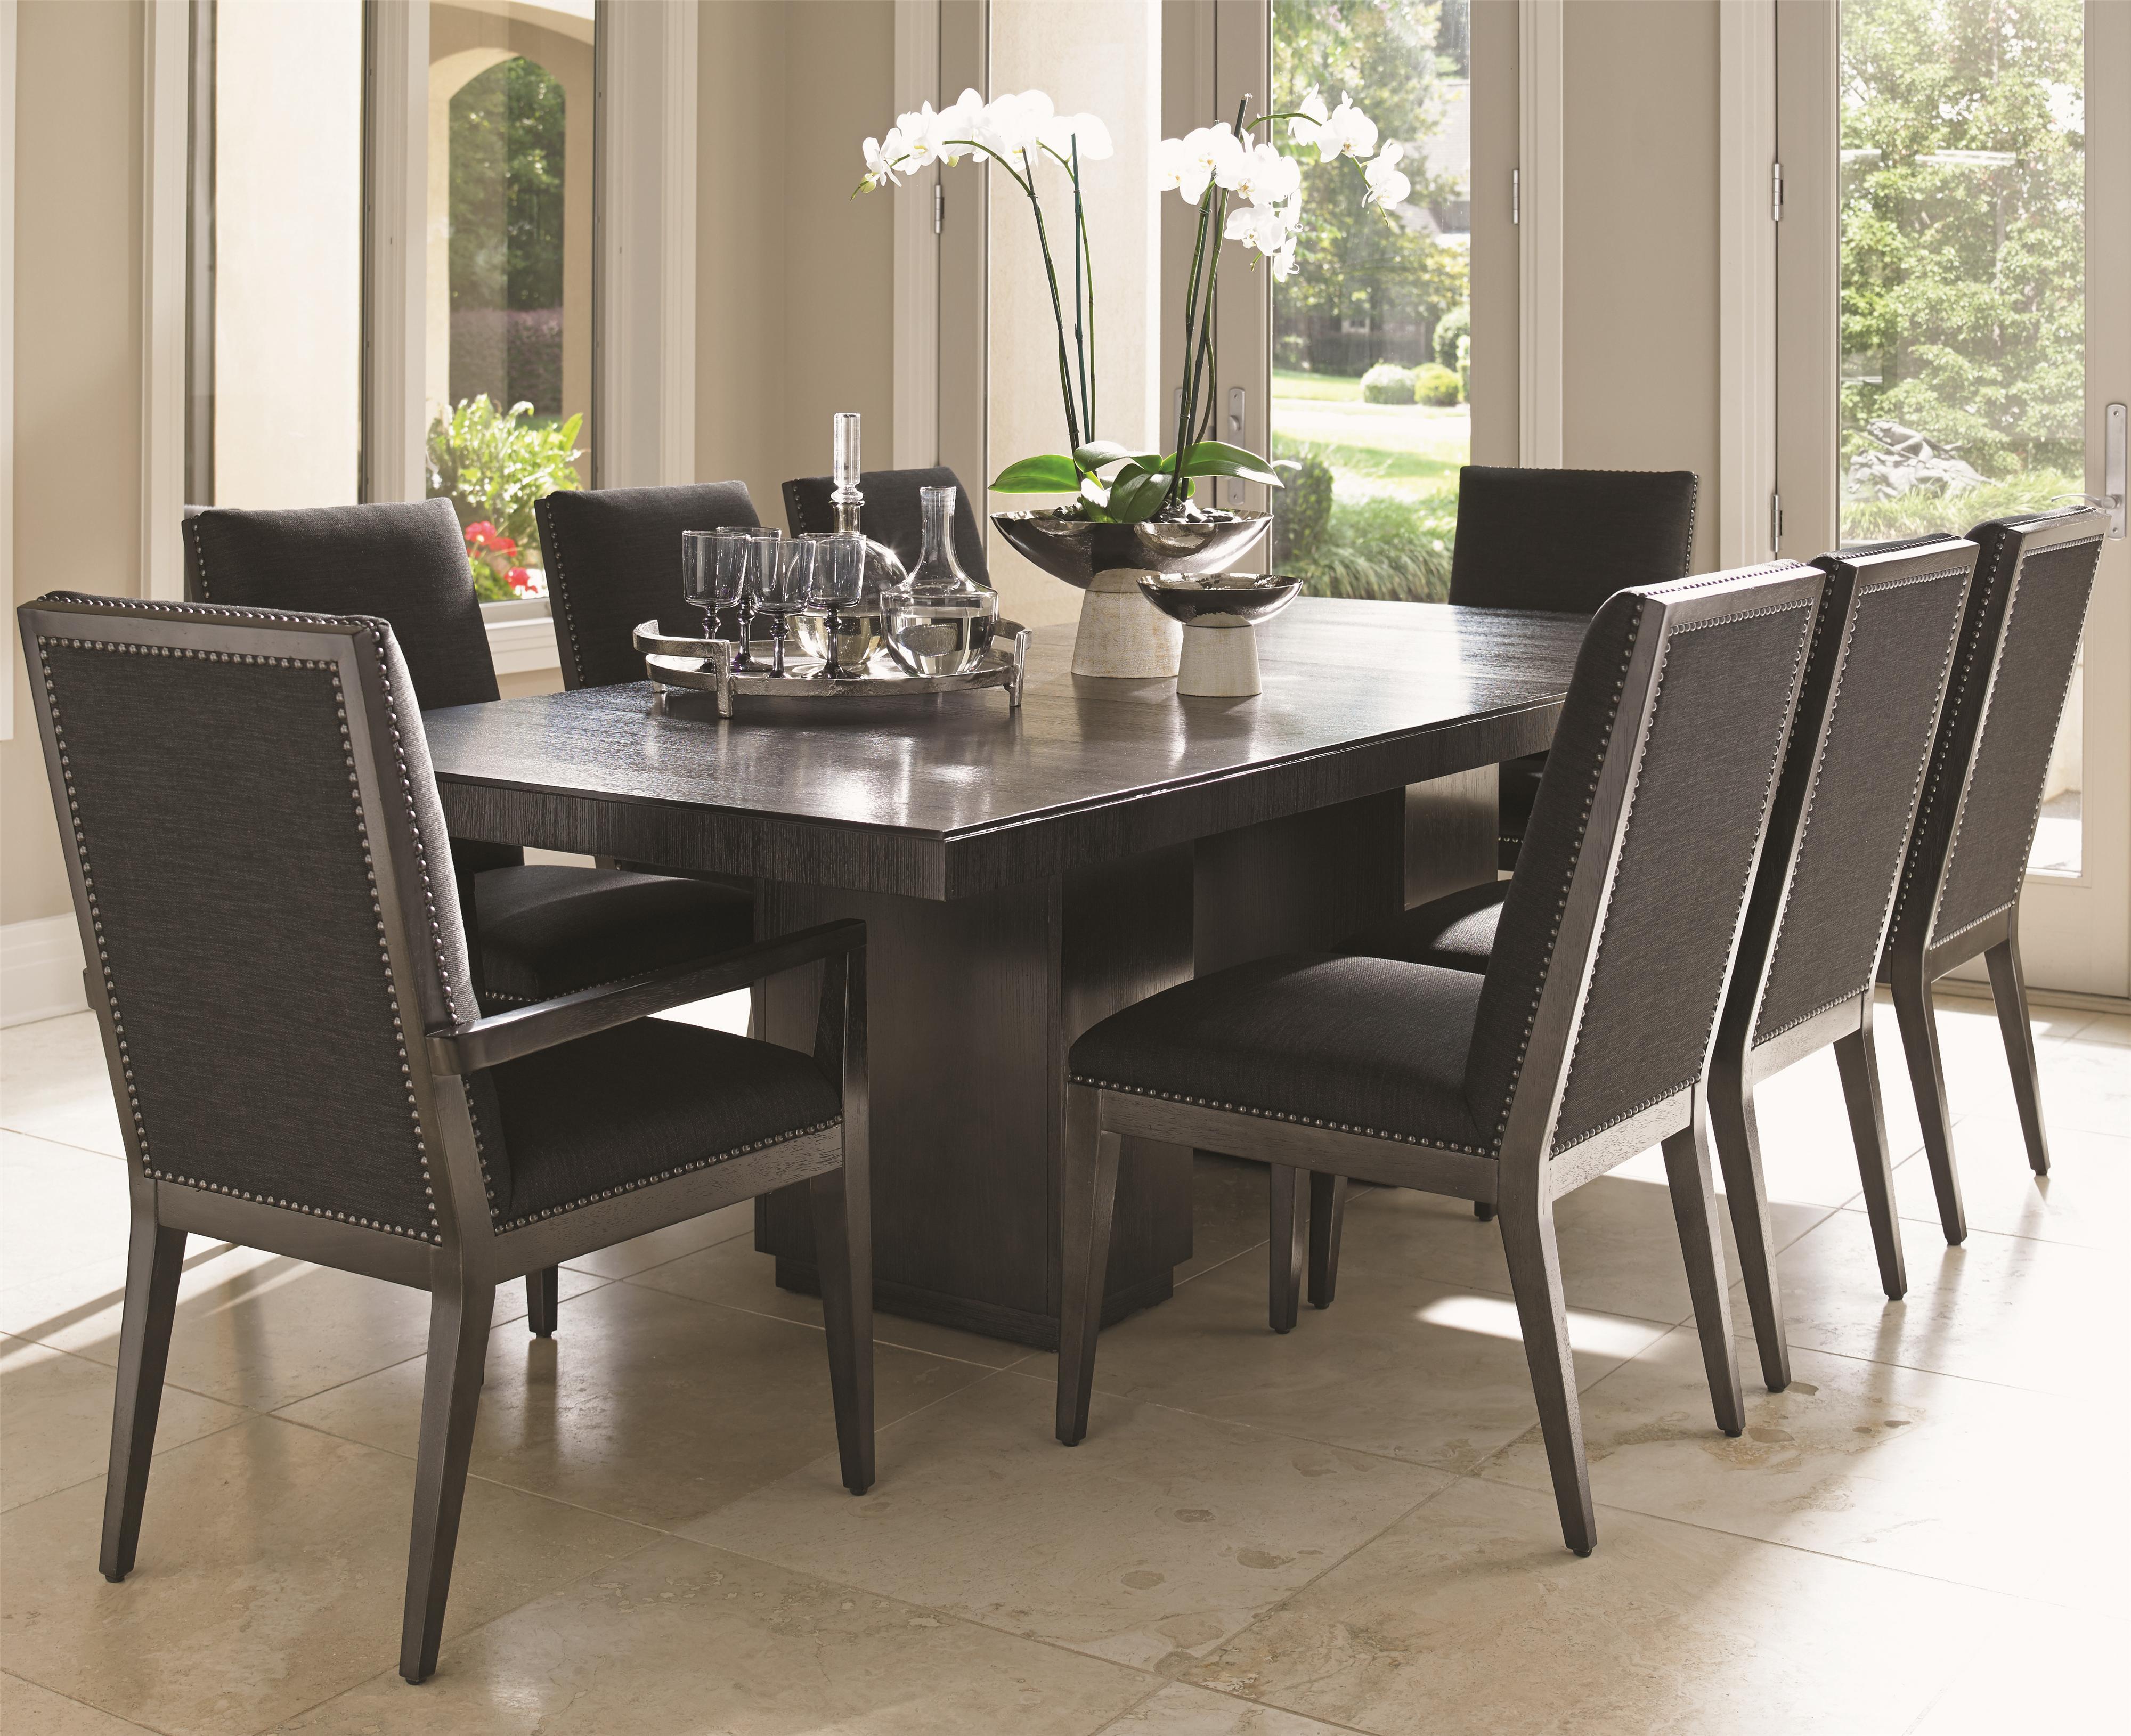 Carrera Modena 9 Pc Dining Set by Lexington at Baer's Furniture